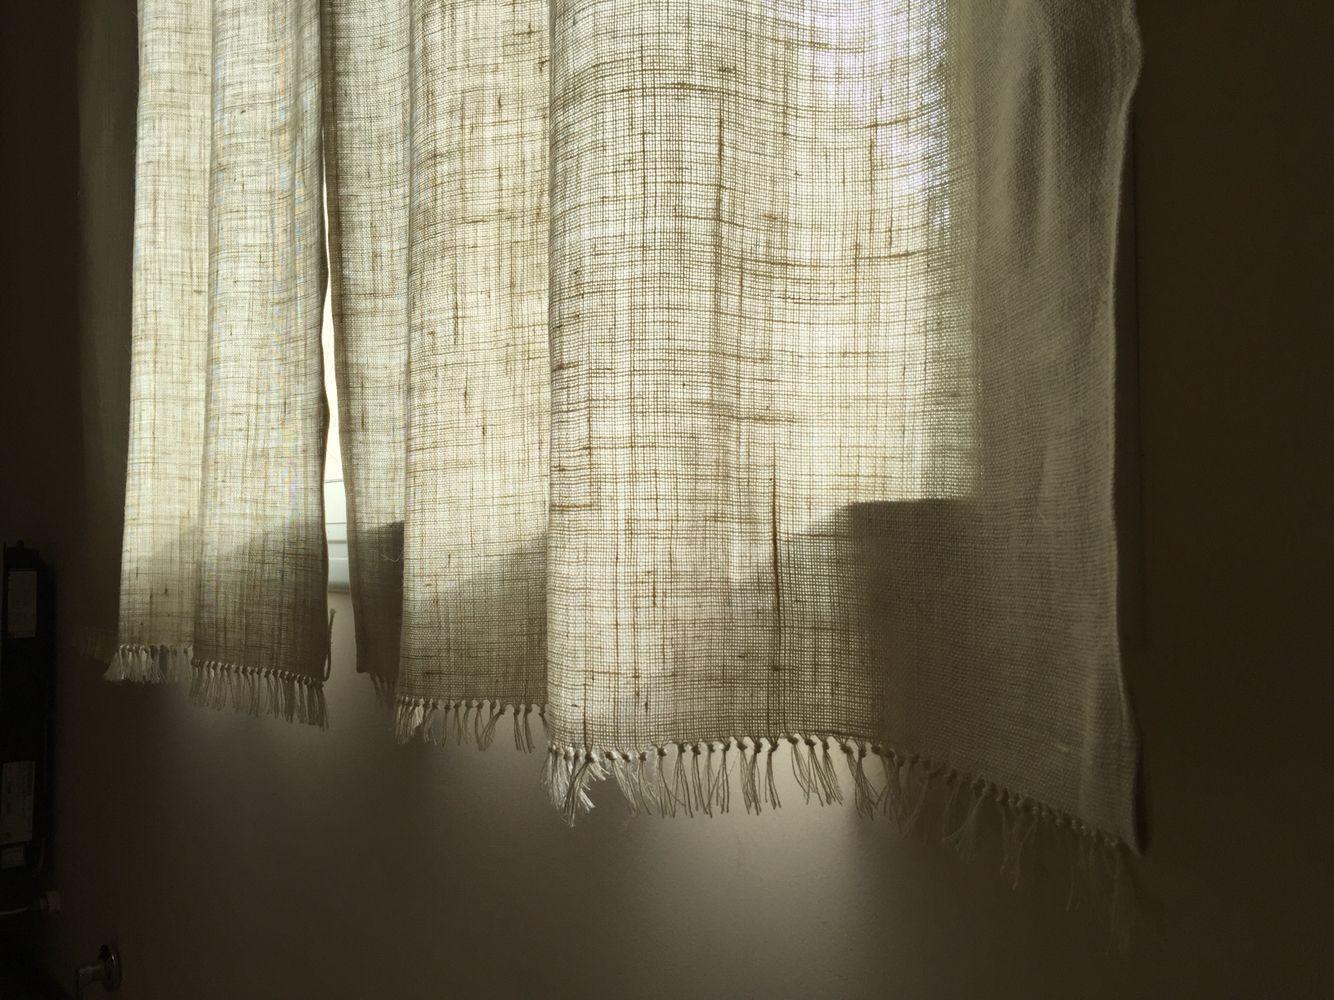 Terminaci n cortinas de arpillera cortinas pinterest - Cortinas de arpillera ...